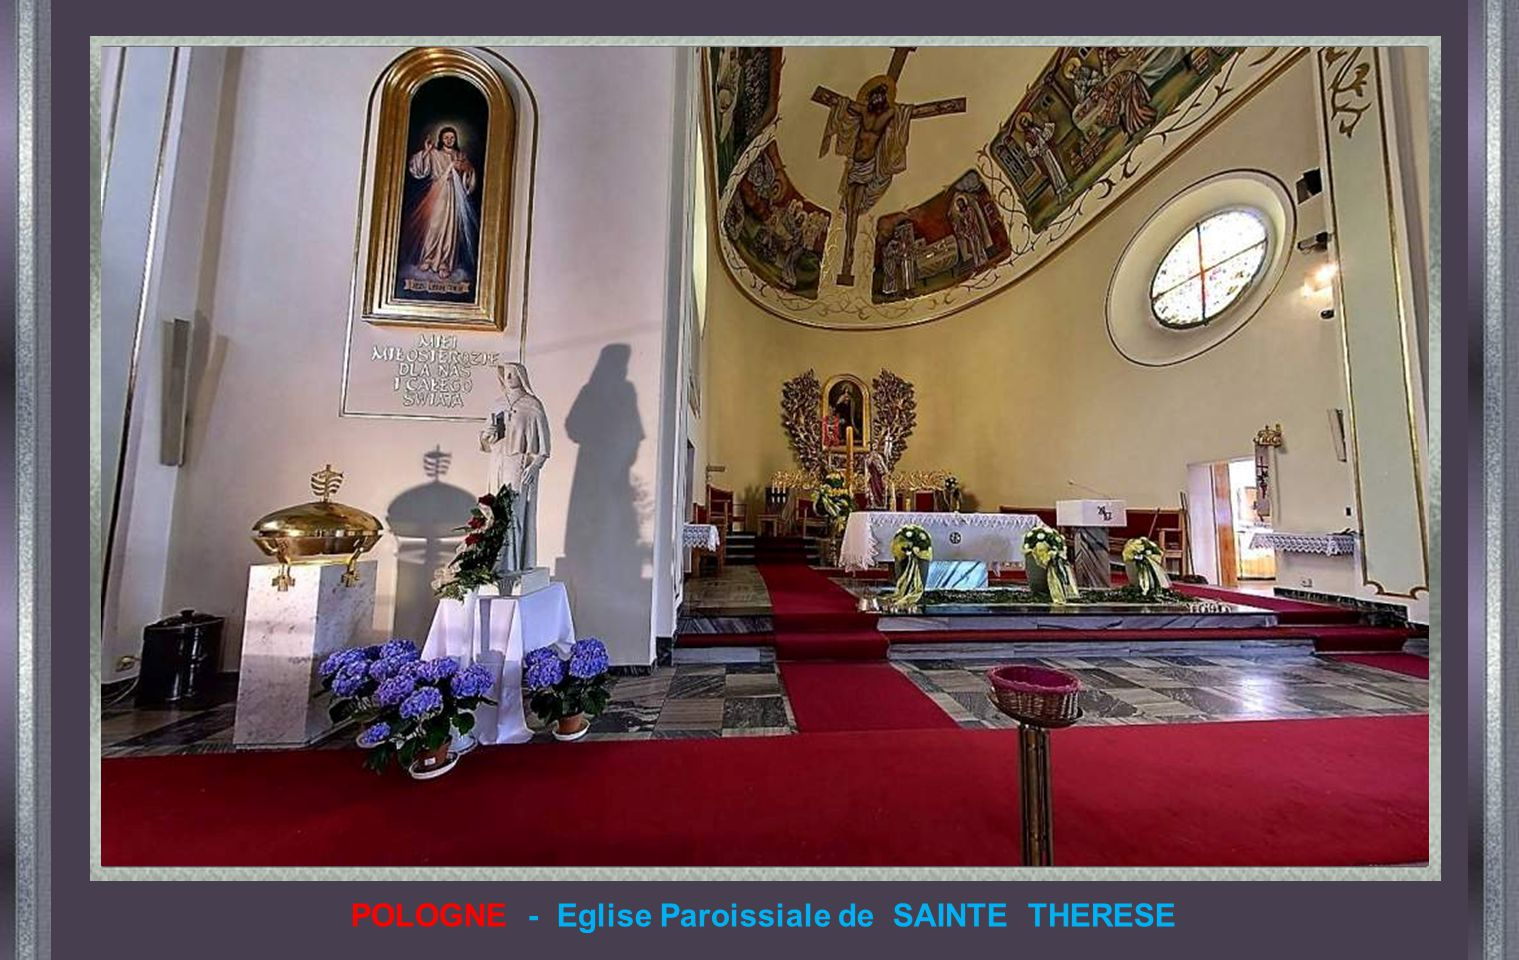 POLOGNE - Eglise Paroissiale de SAINTE THERESE